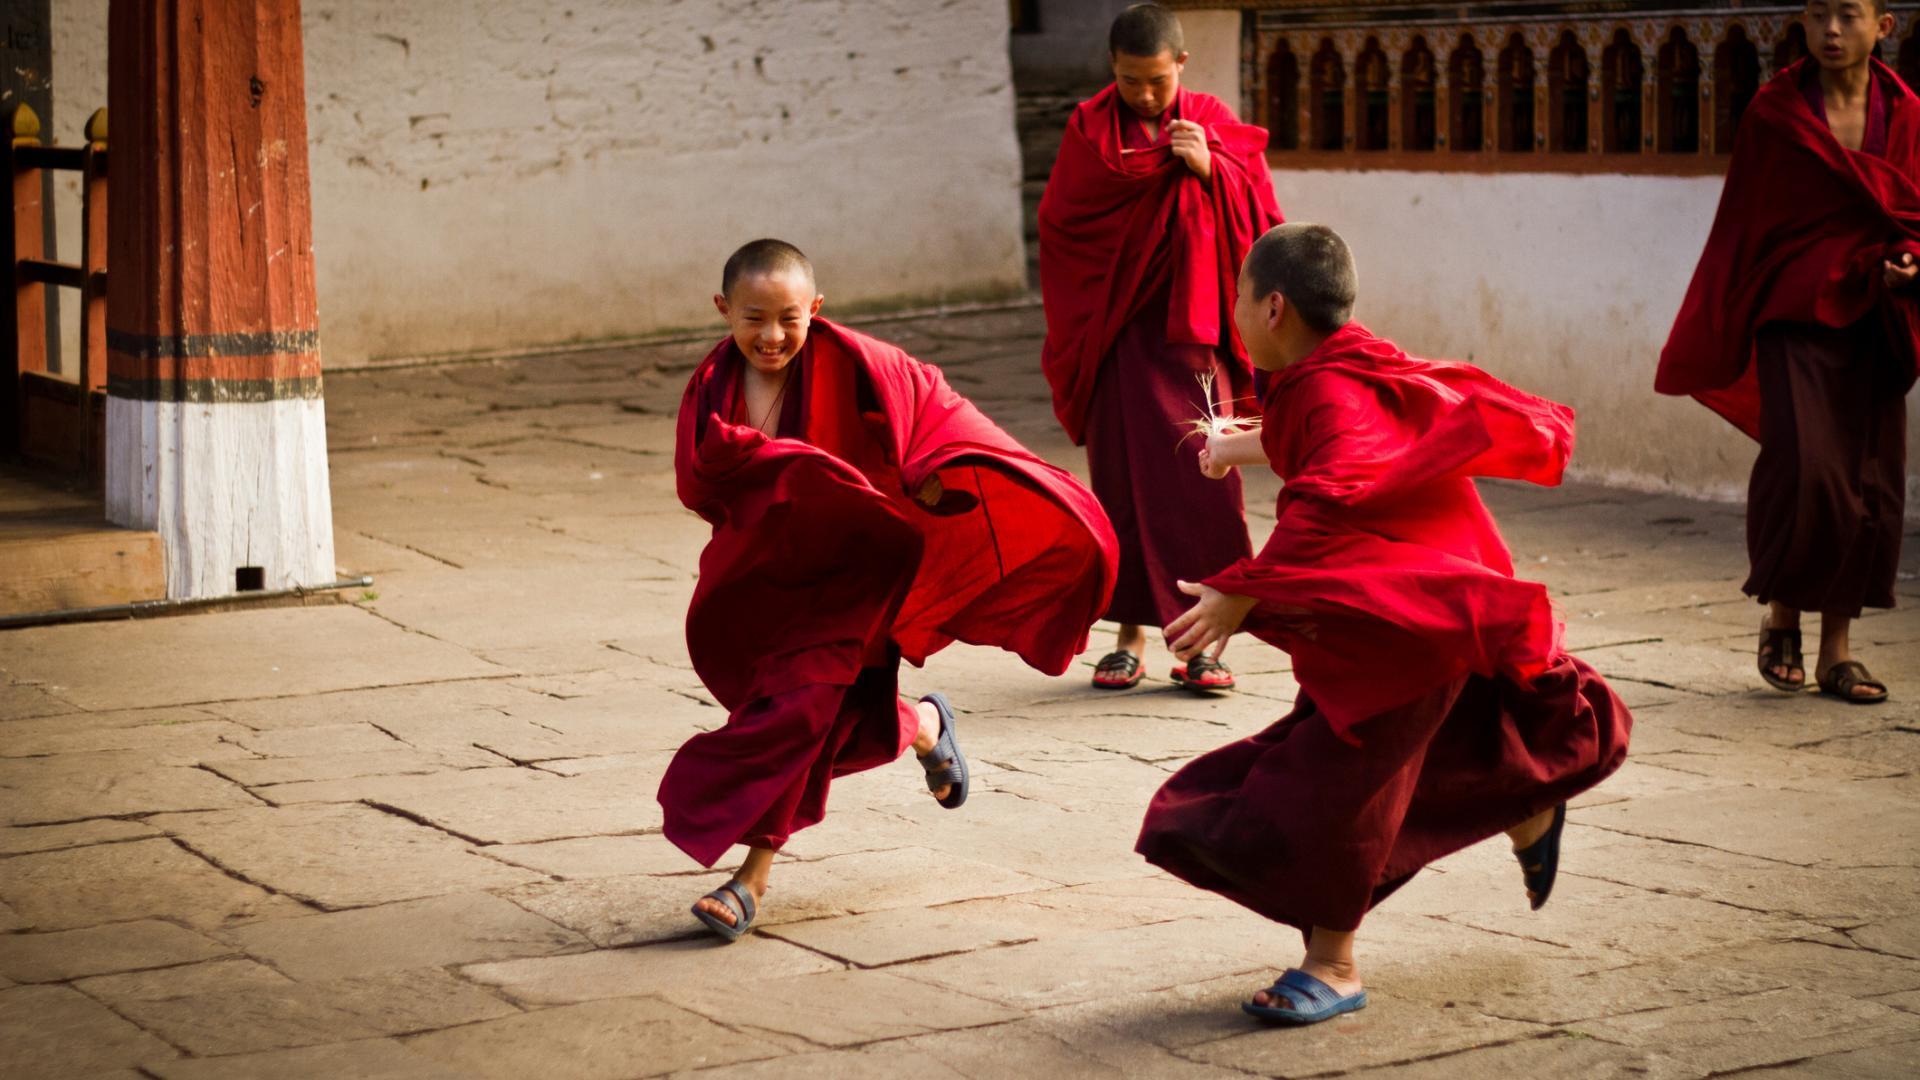 Junge Bhutanesen spielen